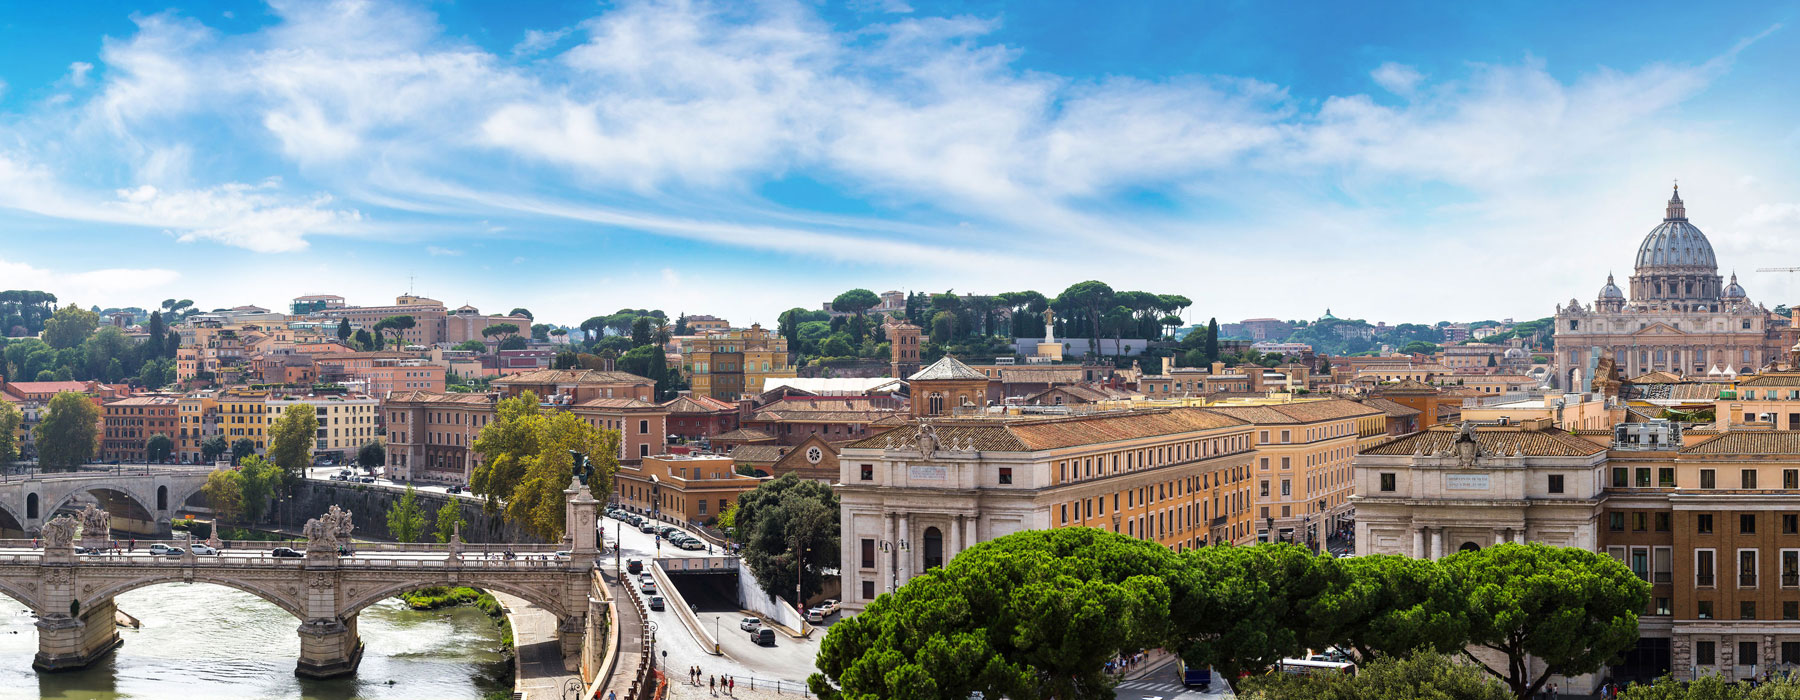 Roma_6.jpg